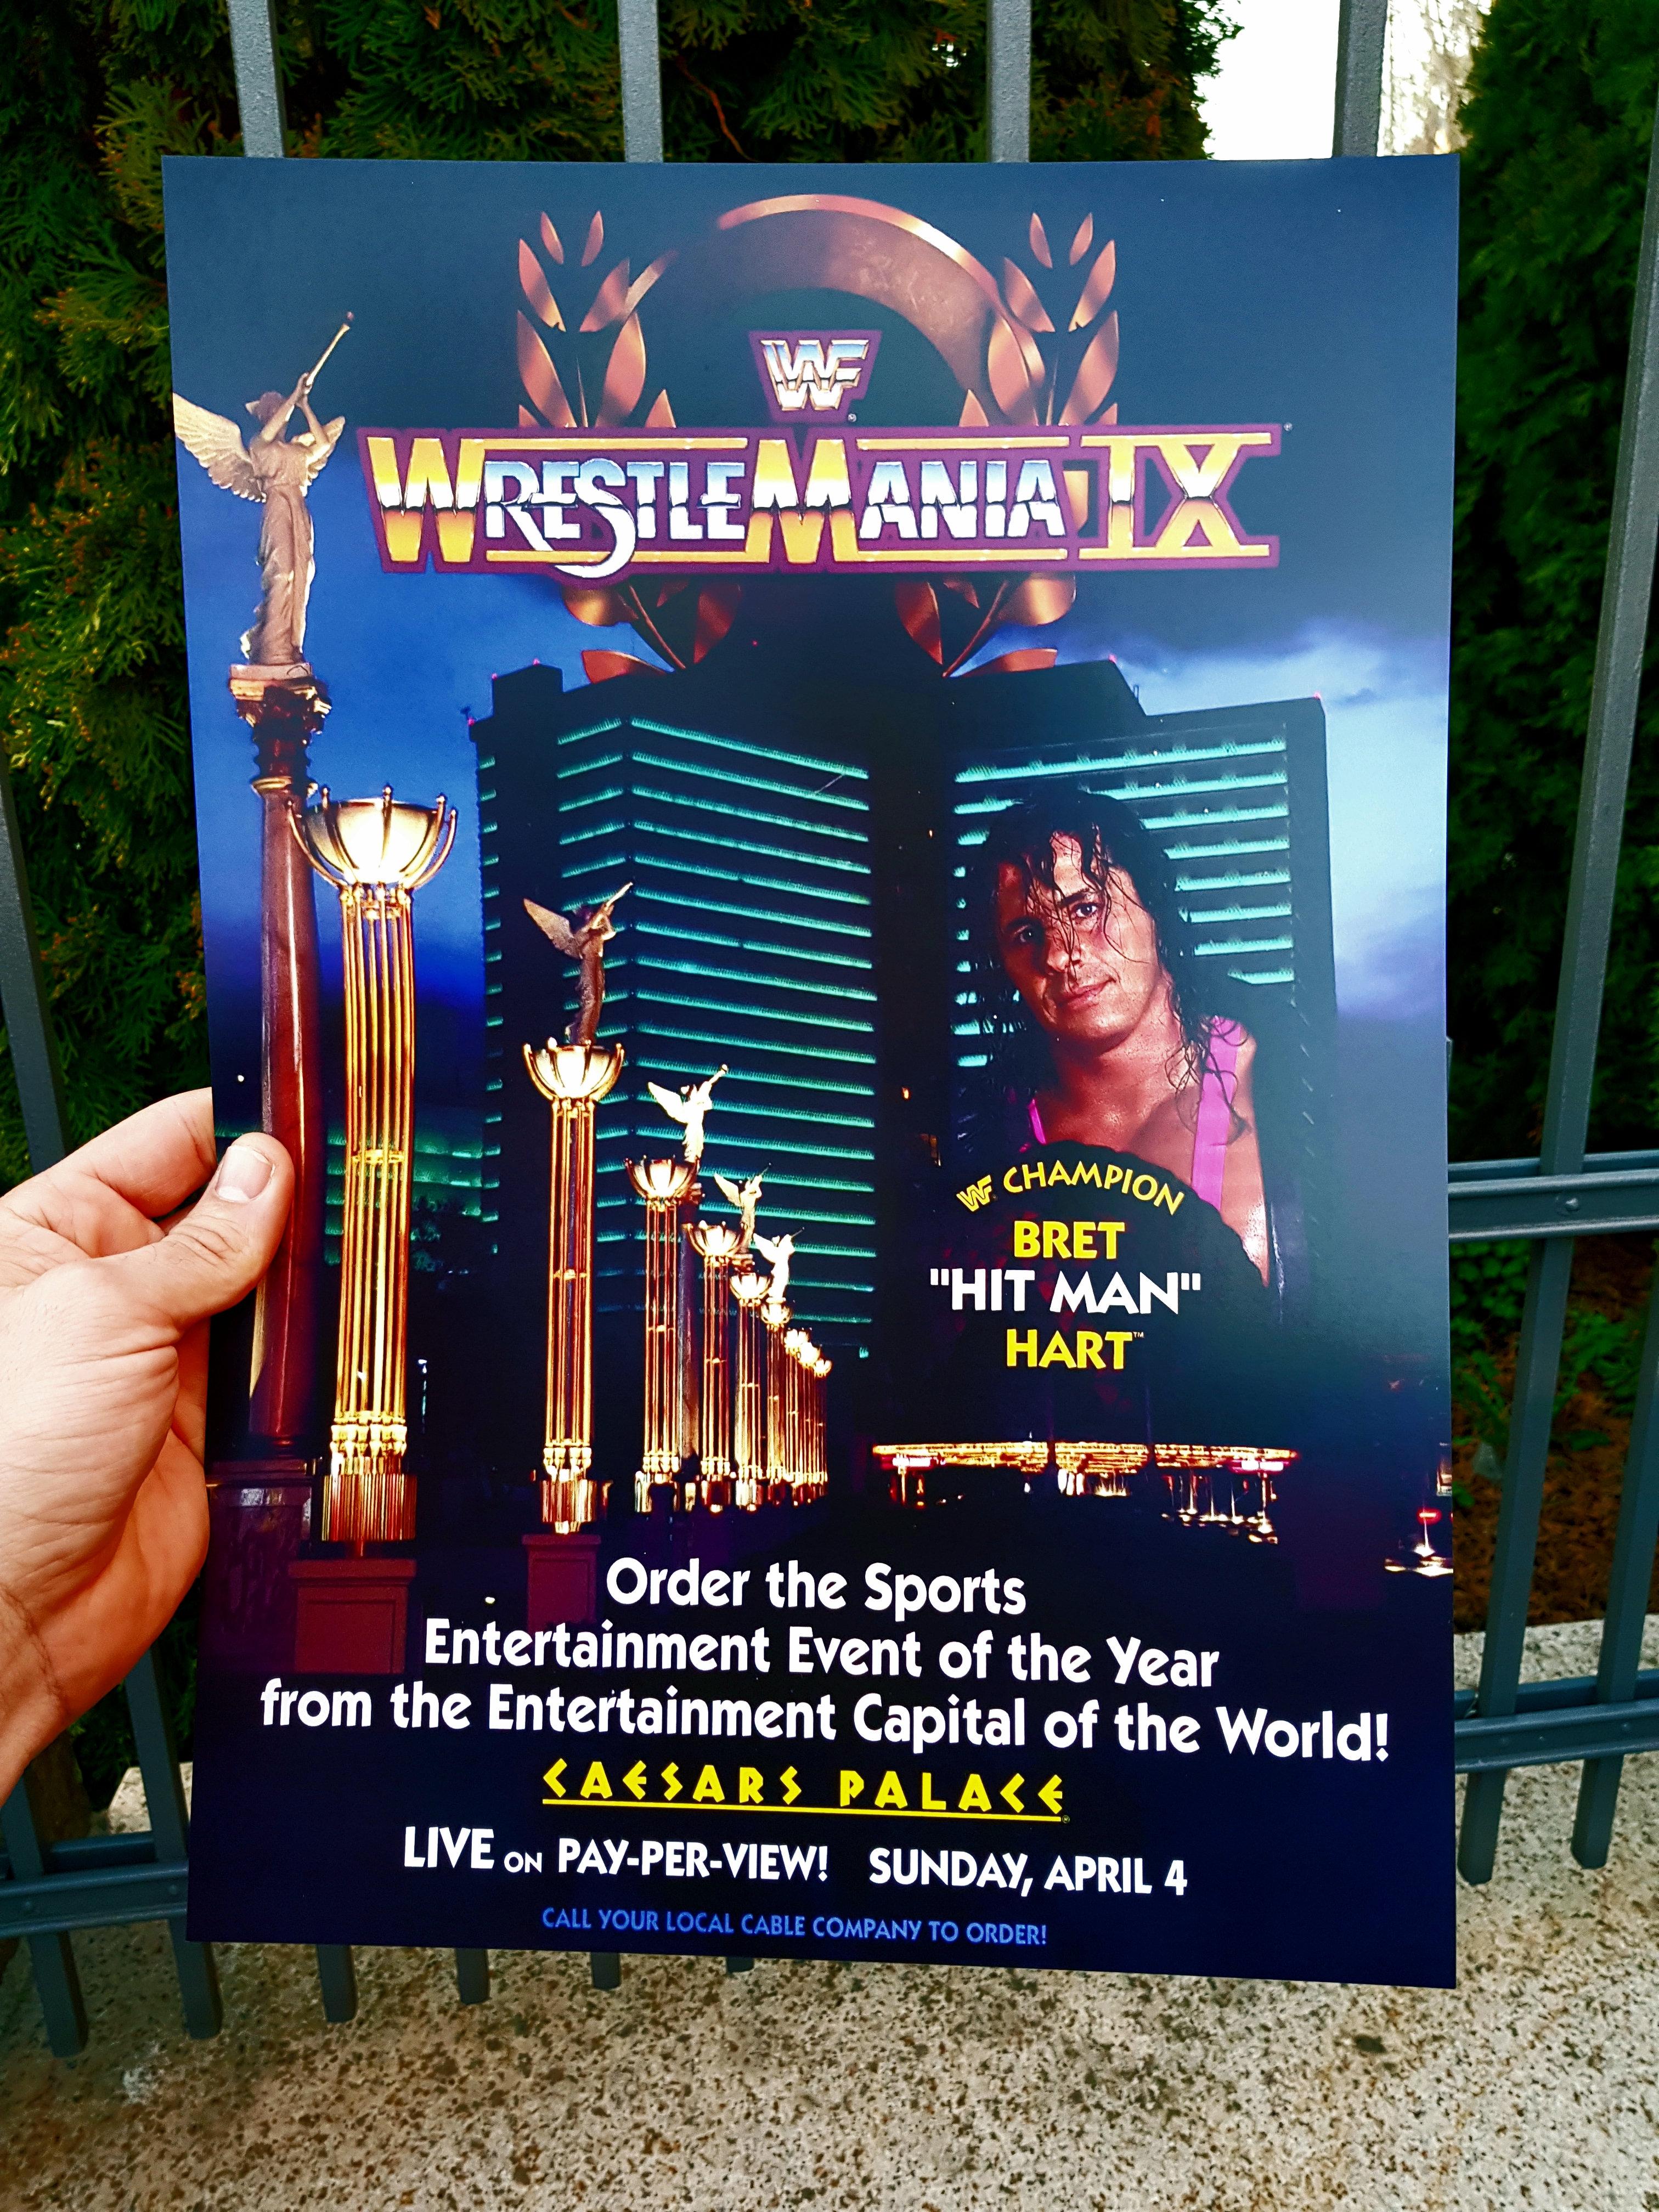 WRESTLEMANIA IX 9 WWF WRESTLING POSTER BRET HITMAN HART HULK HOGAN    hasbromaniacs